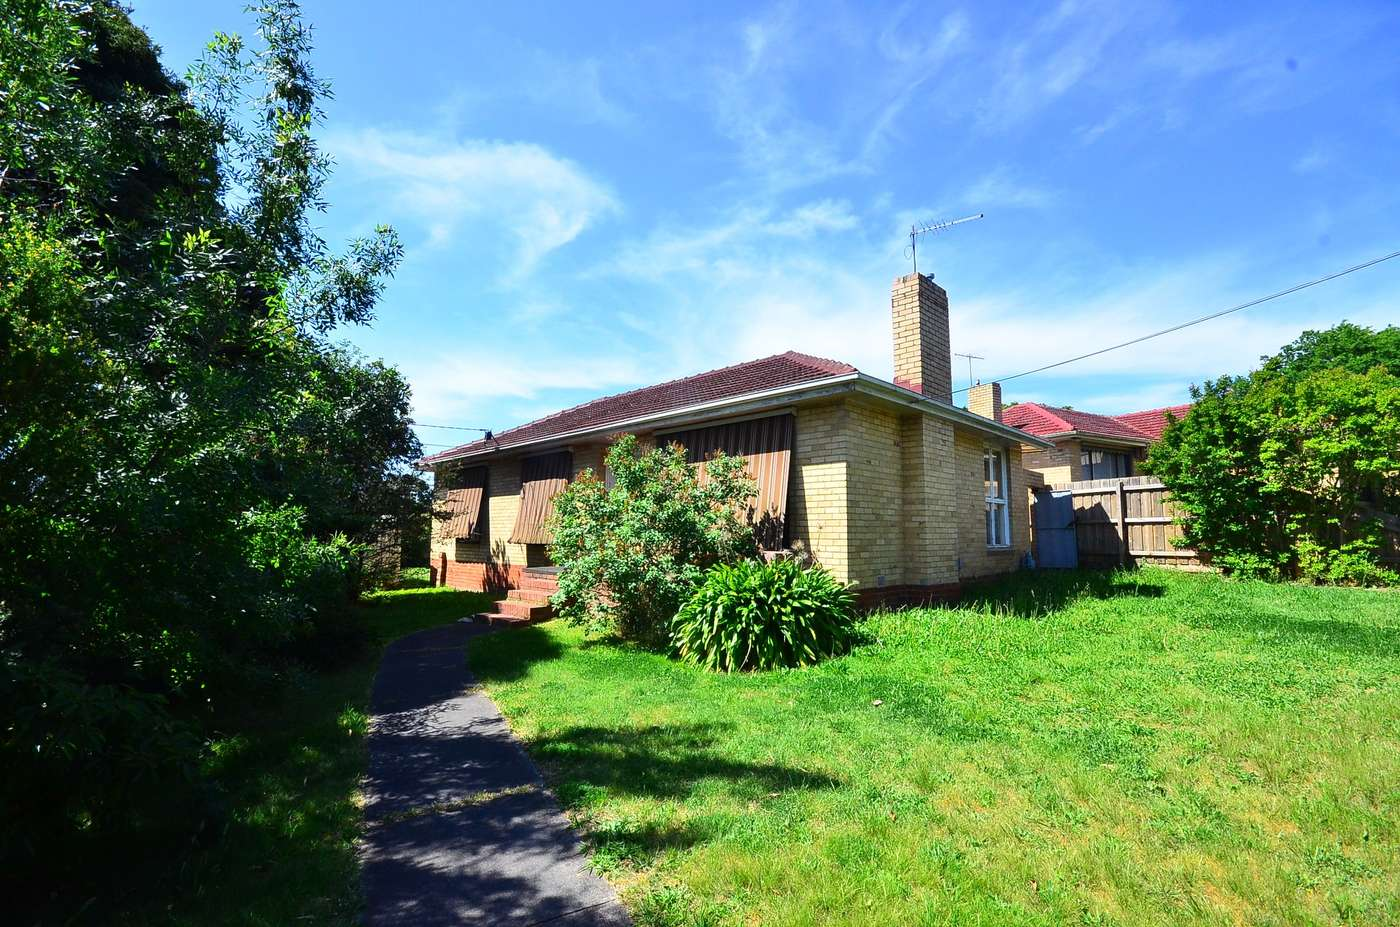 Main view of Homely house listing, 9 Katrina Street, Blackburn North, VIC 3130